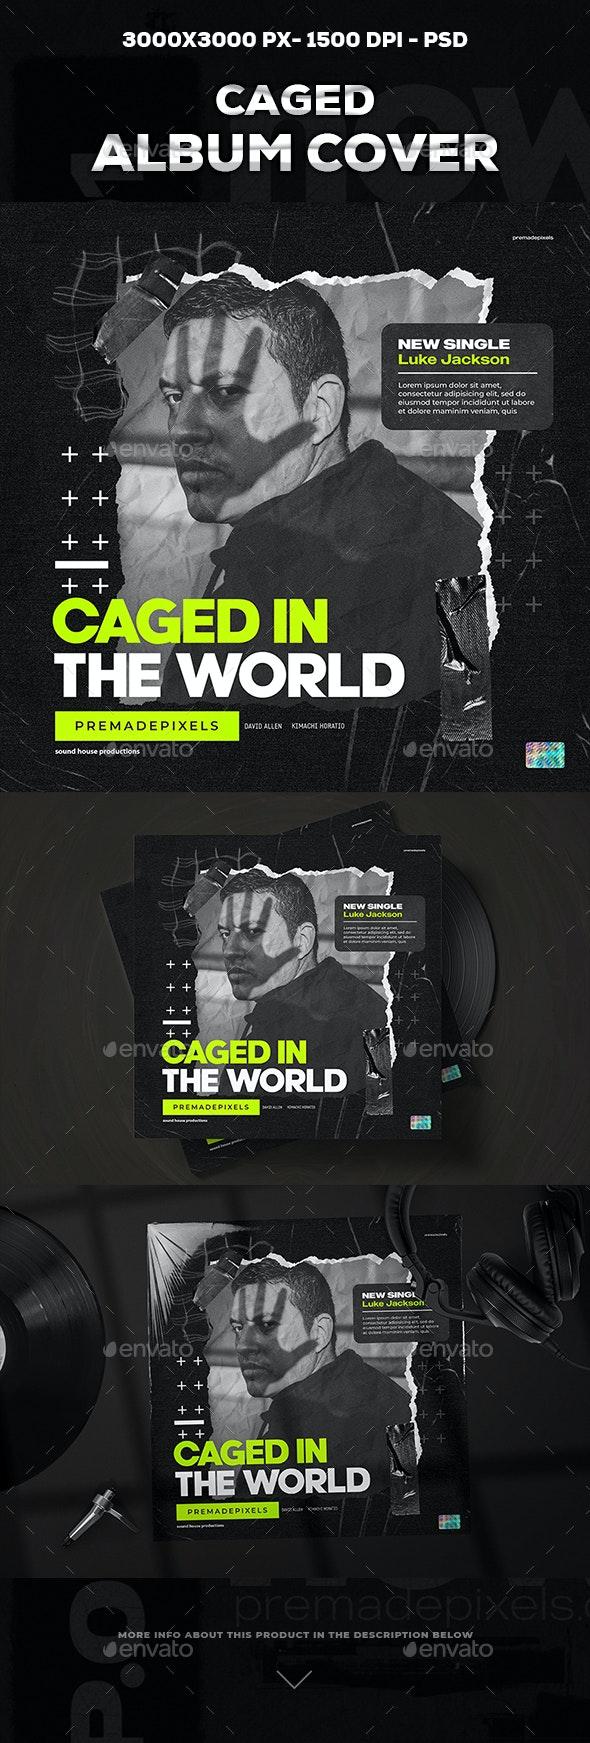 Caged Album Cover Art - Social Media Web Elements